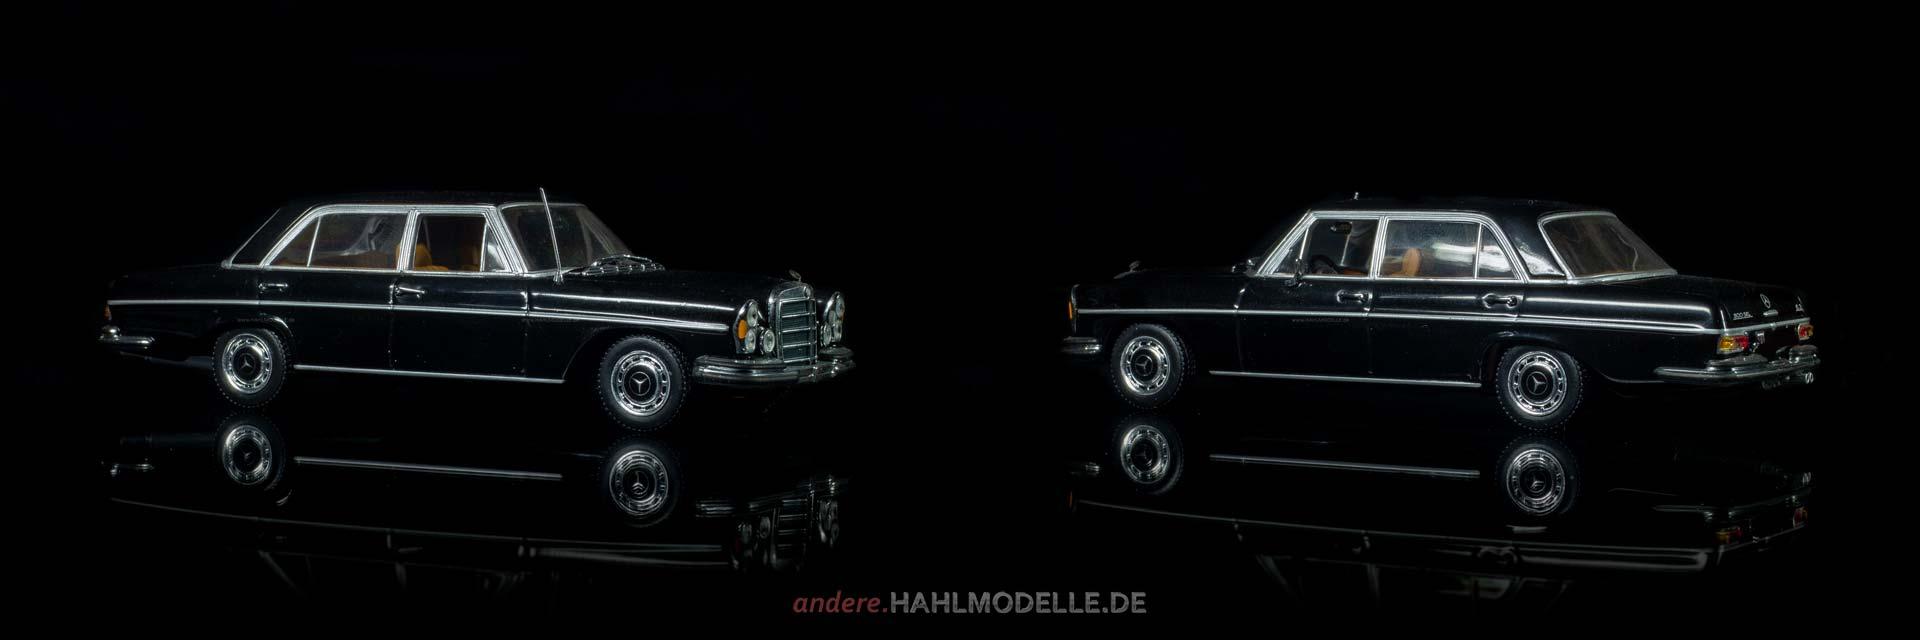 Mercedes-Benz 300 SEL 6.3 (W 109) | Limousine | Miichamps | www.andere.hahlmodelle.de